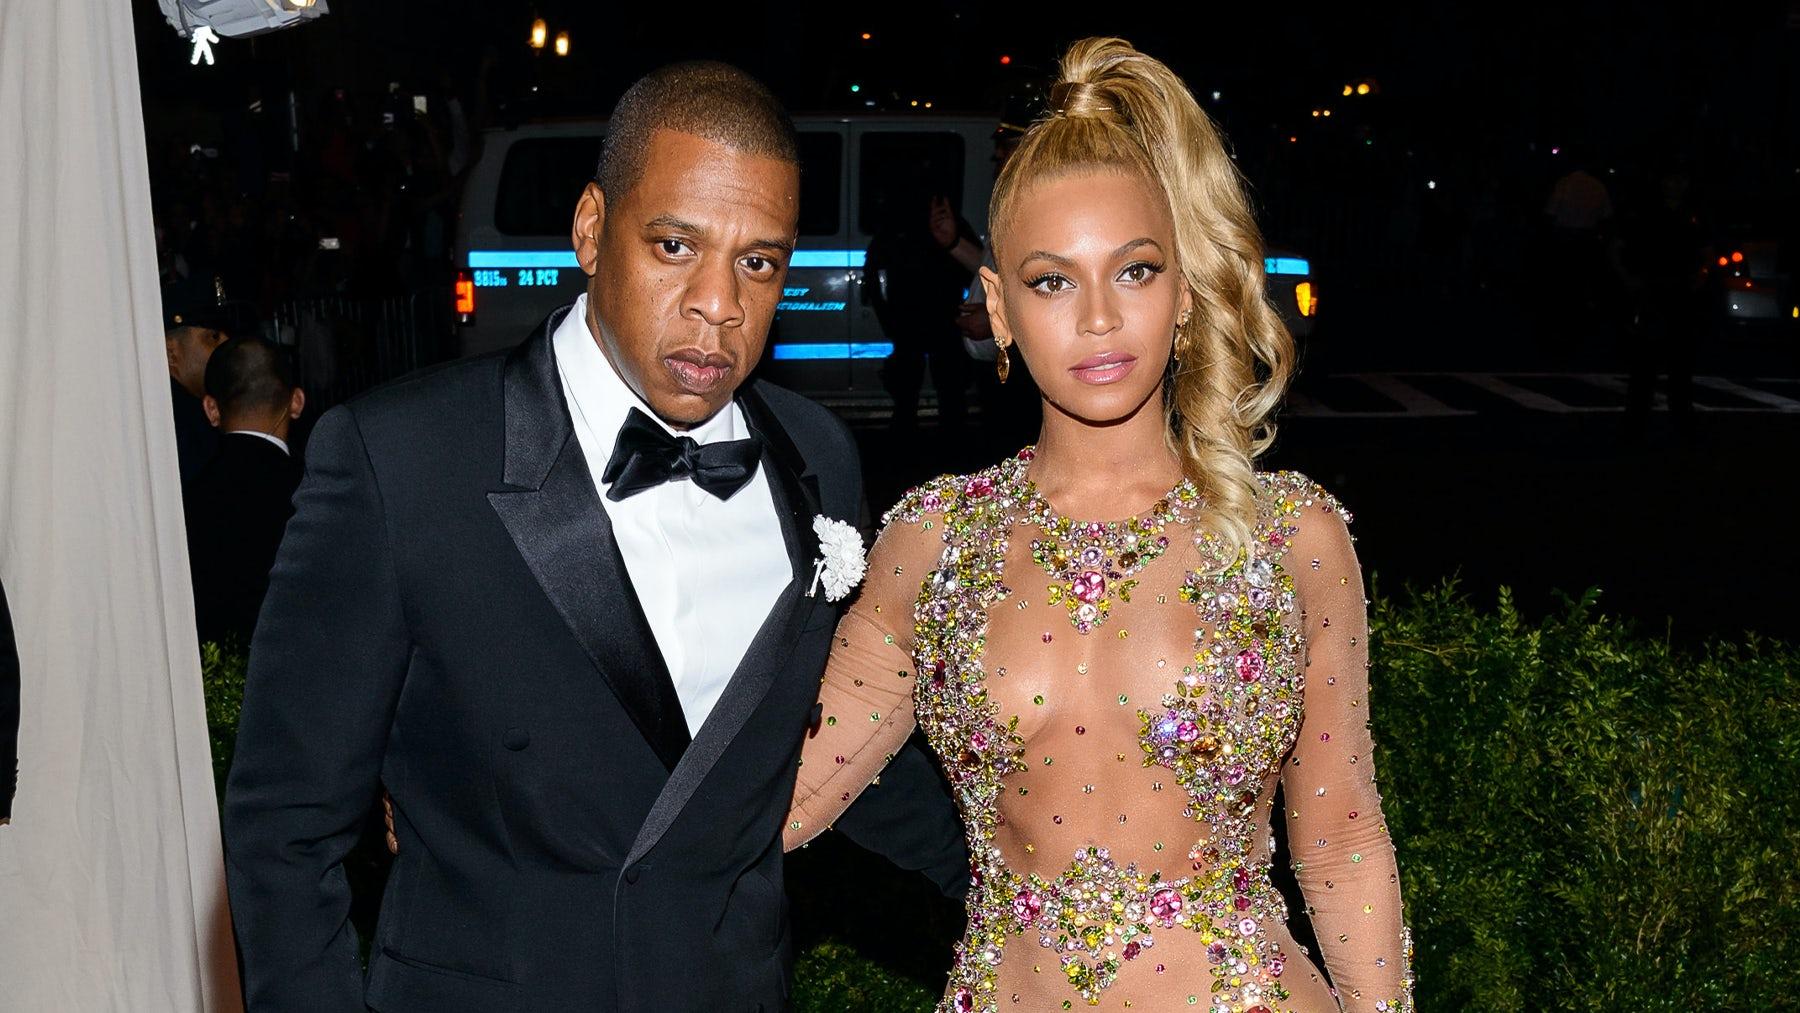 Beyoncé and Jay-Z are Tiffany's newest ambassadors. Shutterstock.